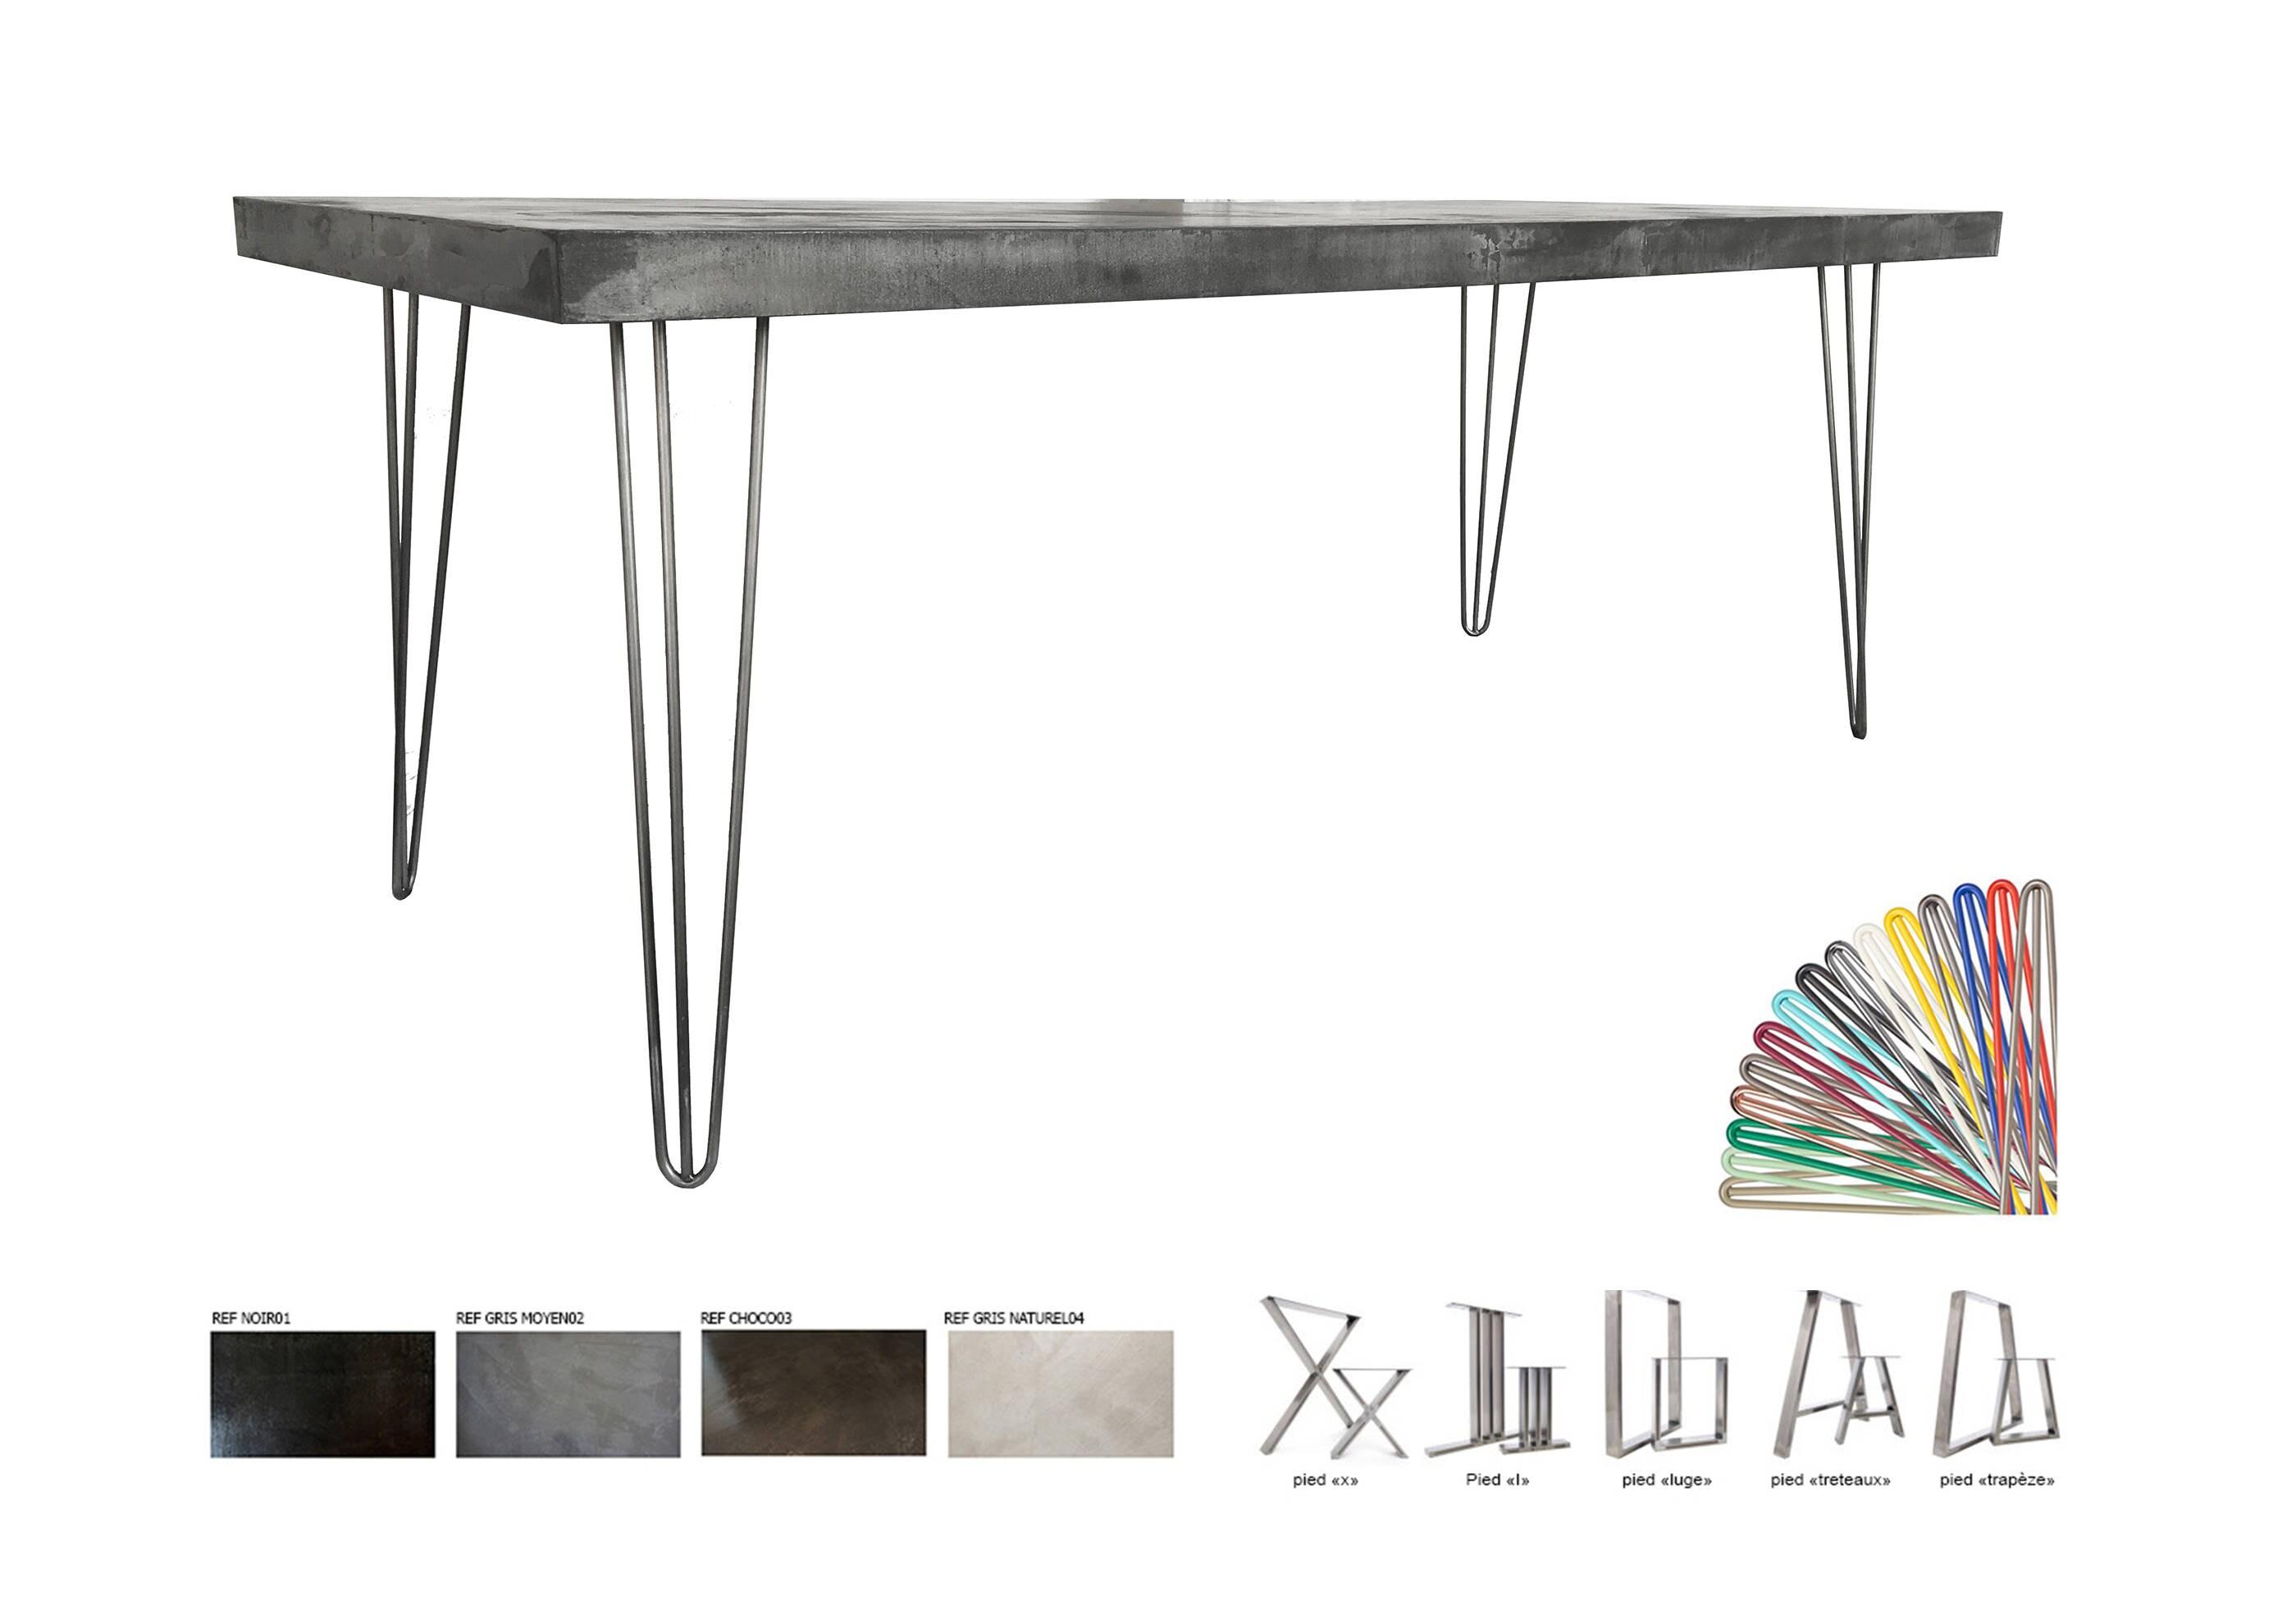 Concrete Table Waxed Ultra Lightweight 200x80cm Steel Feet # Meuble Tv Treteaux